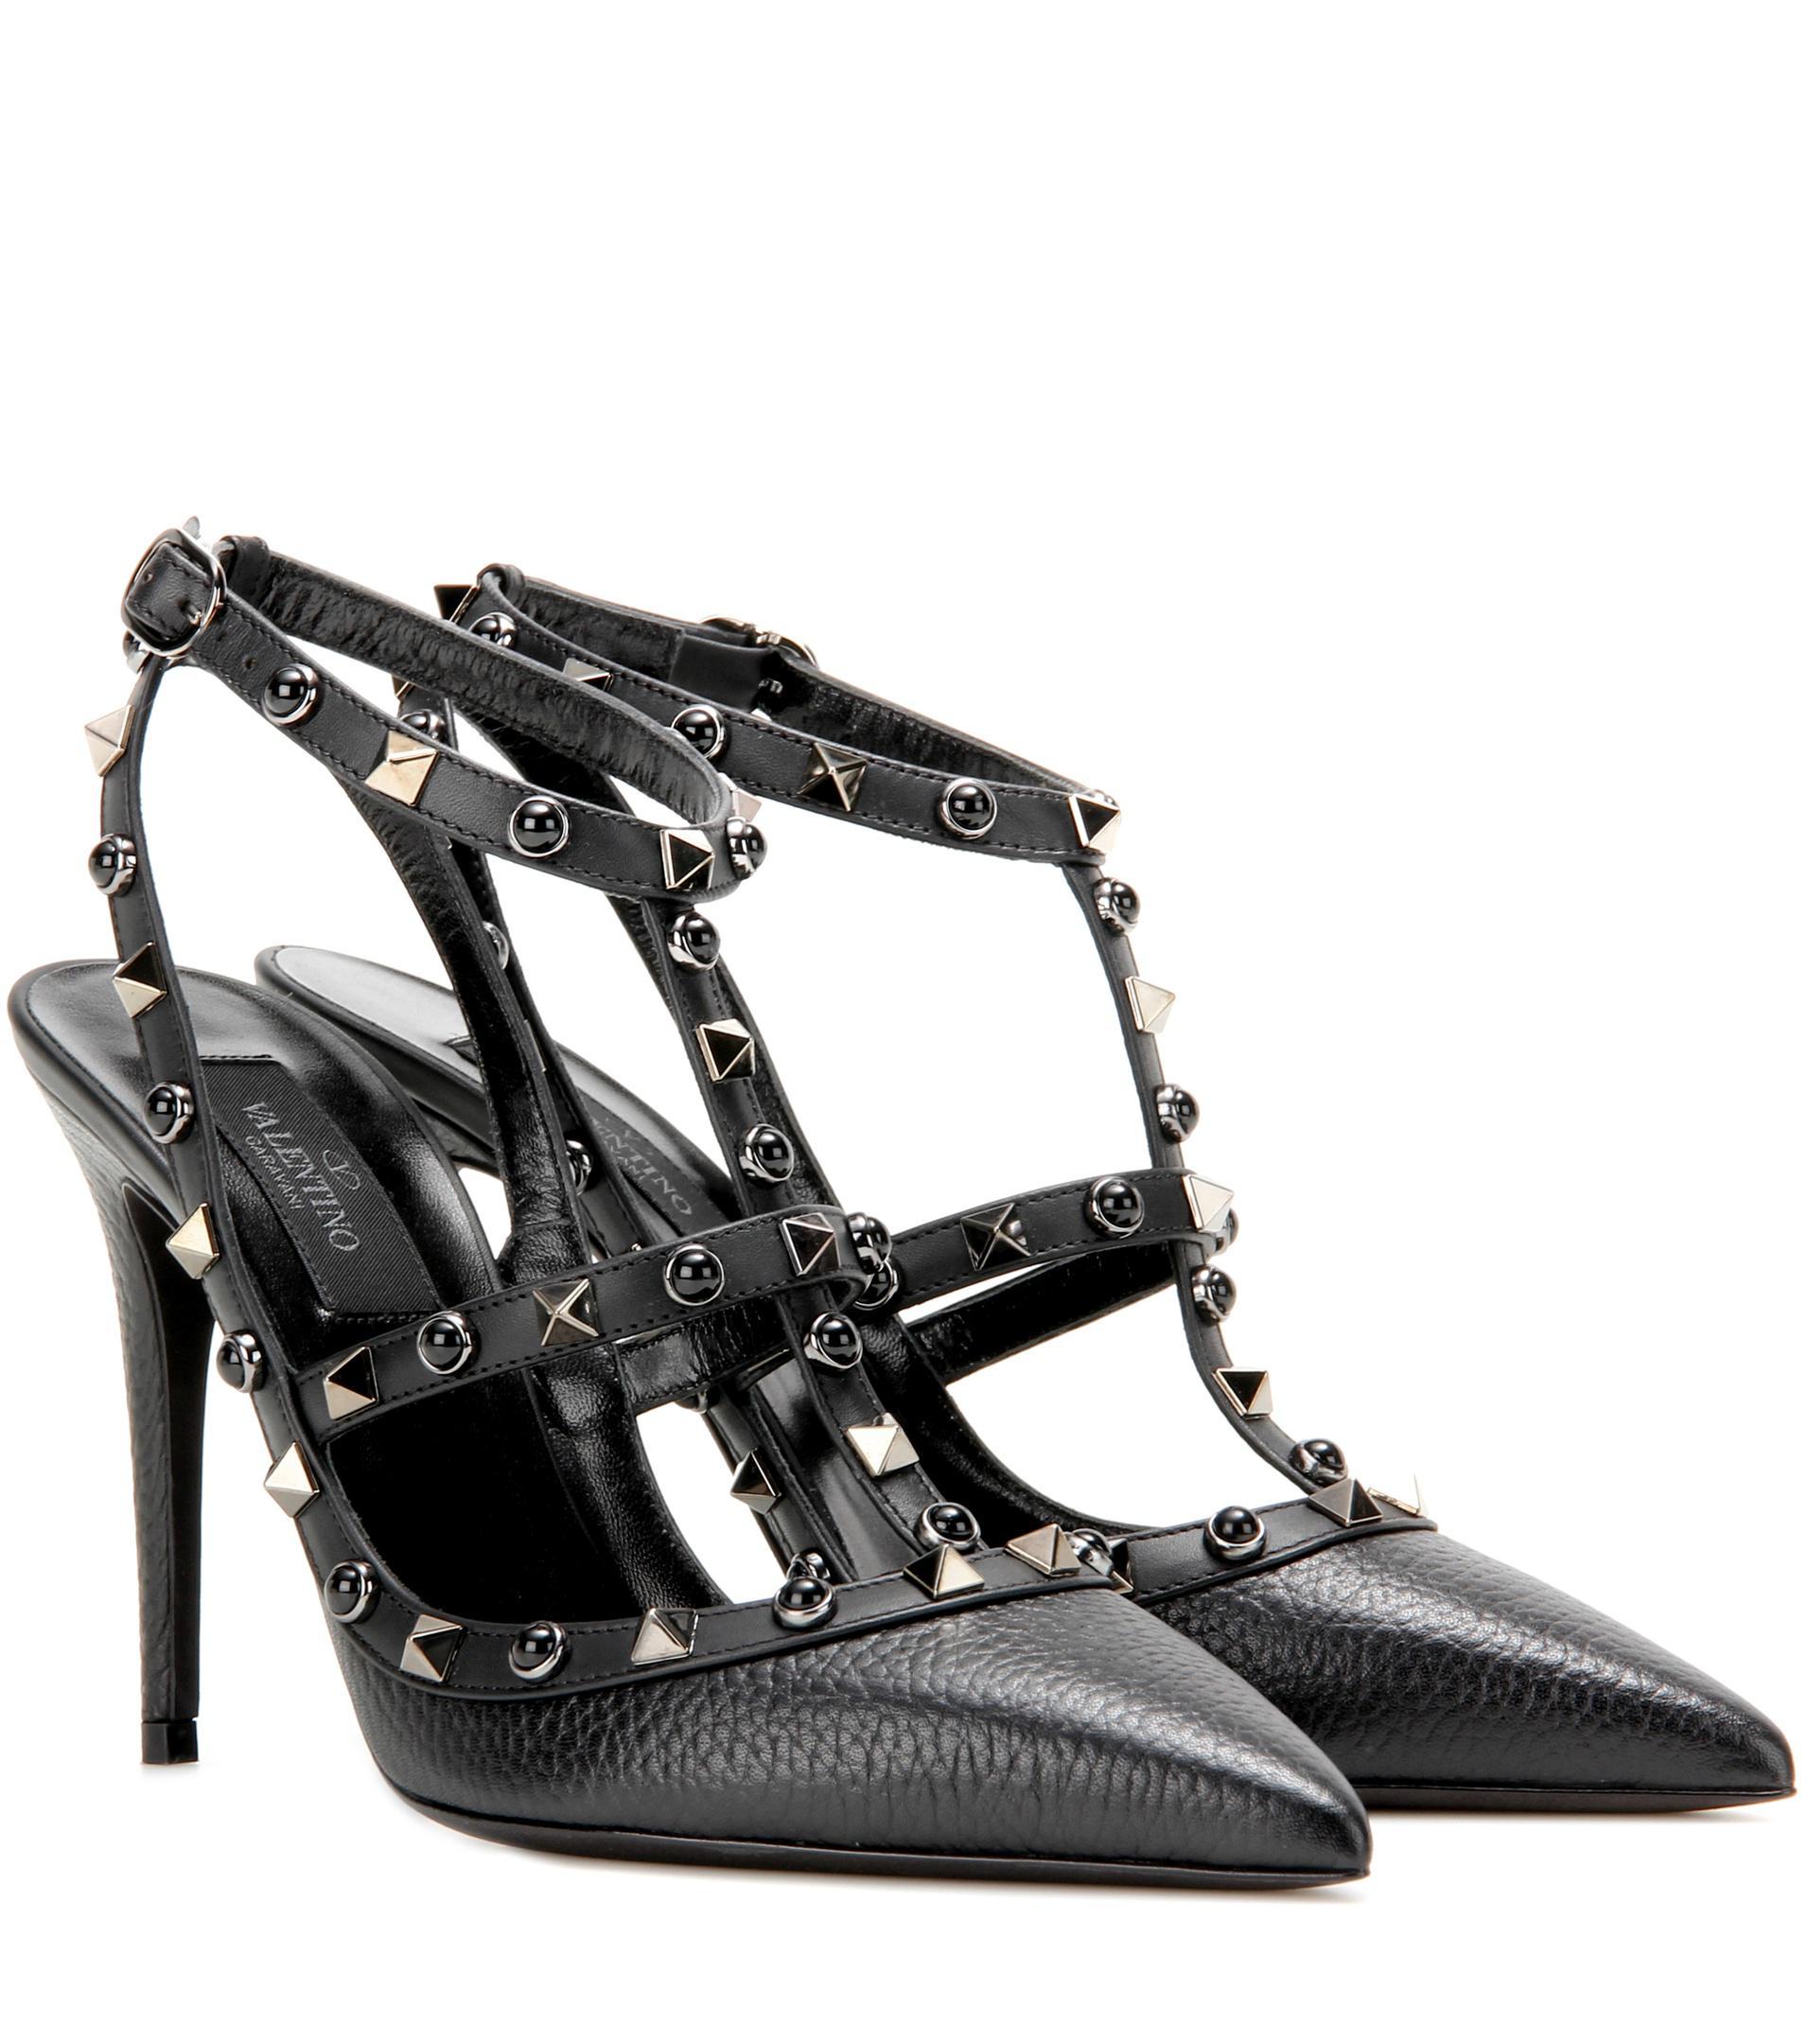 c22c69afbfd5 Valentino Rockstud Rolling Noir Leather Pumps in Black - Lyst